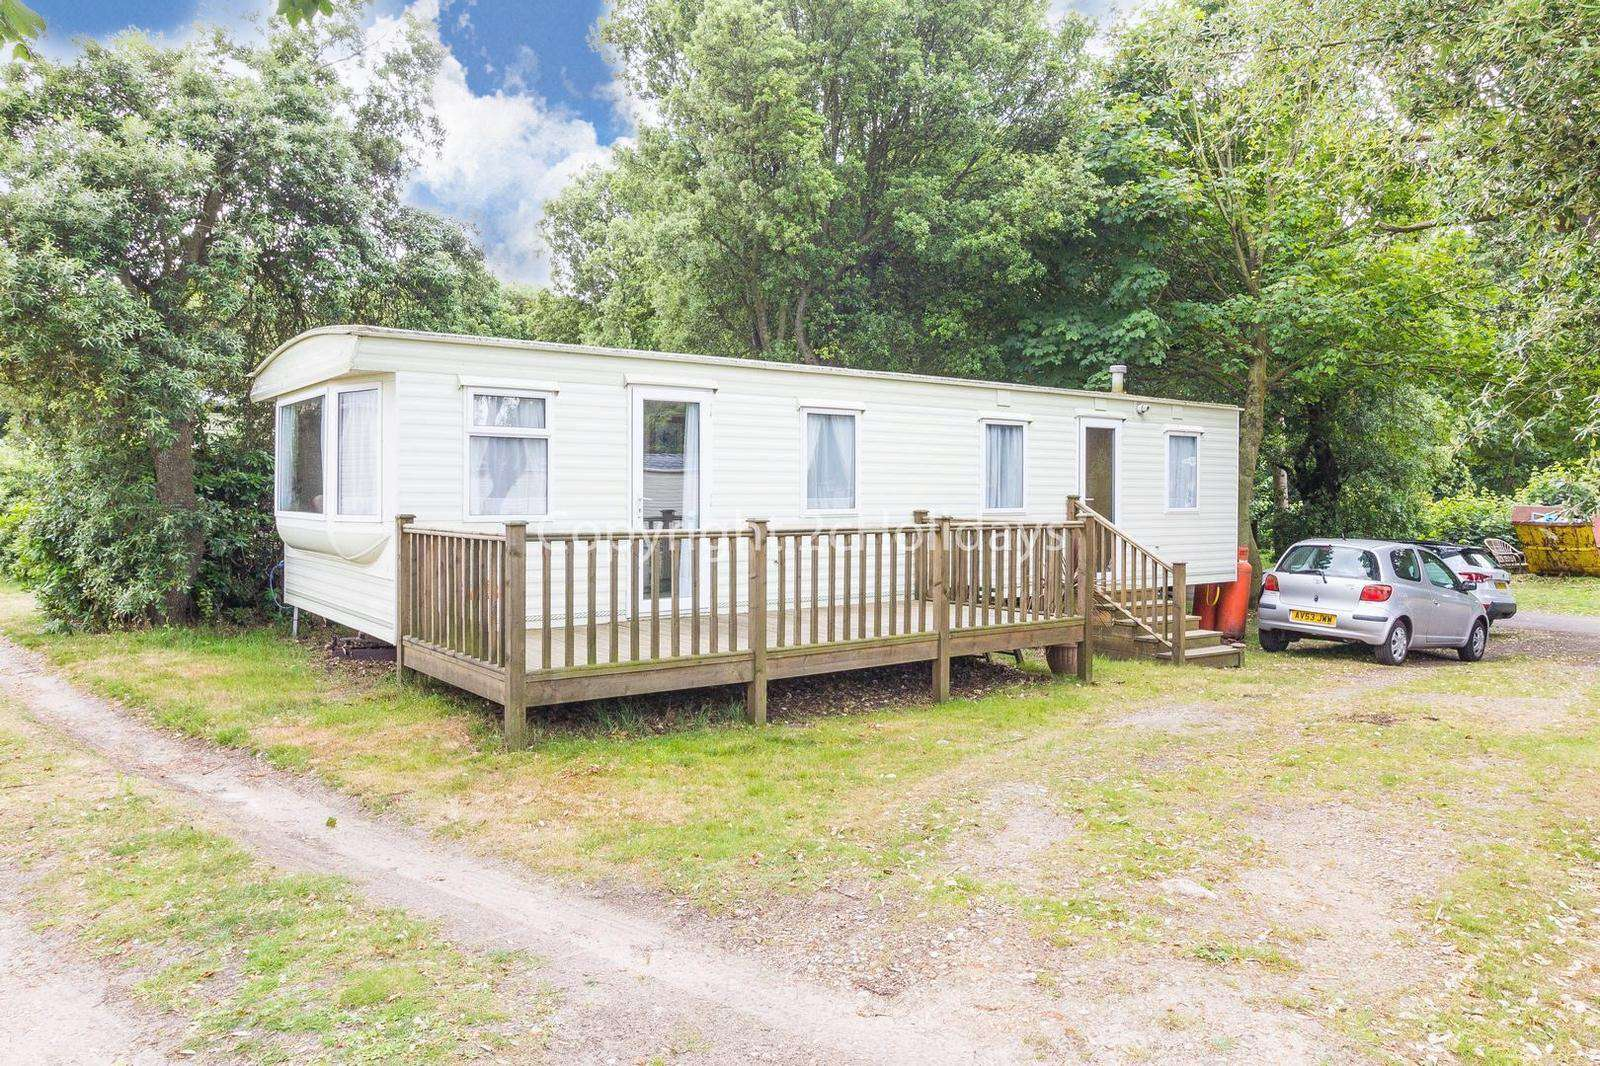 Cosy accommodation